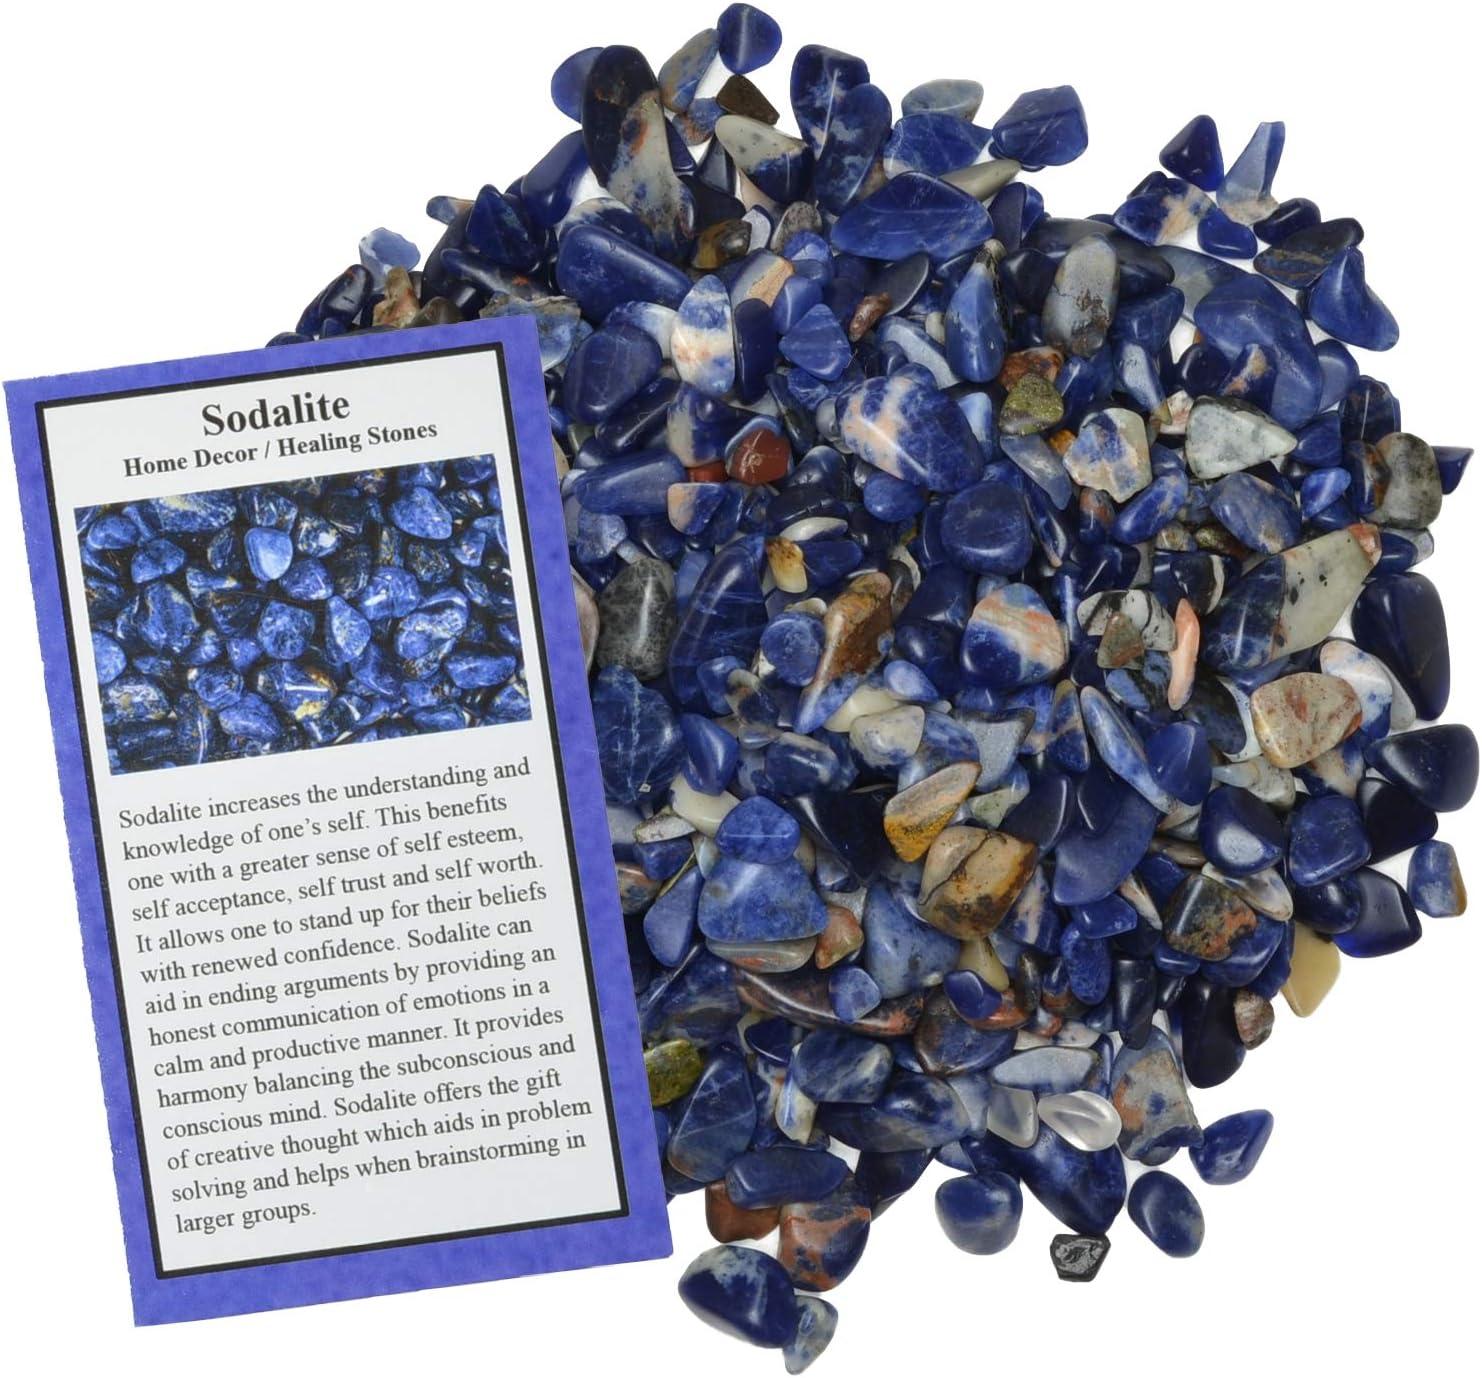 Digging Dolls: 1 lb of Tumbled Sodalite Chip Stones - Polished Rocks for Crafts, Art, Vase Filler, Decoration, Reiki, Crystal Jewelry Making and More!